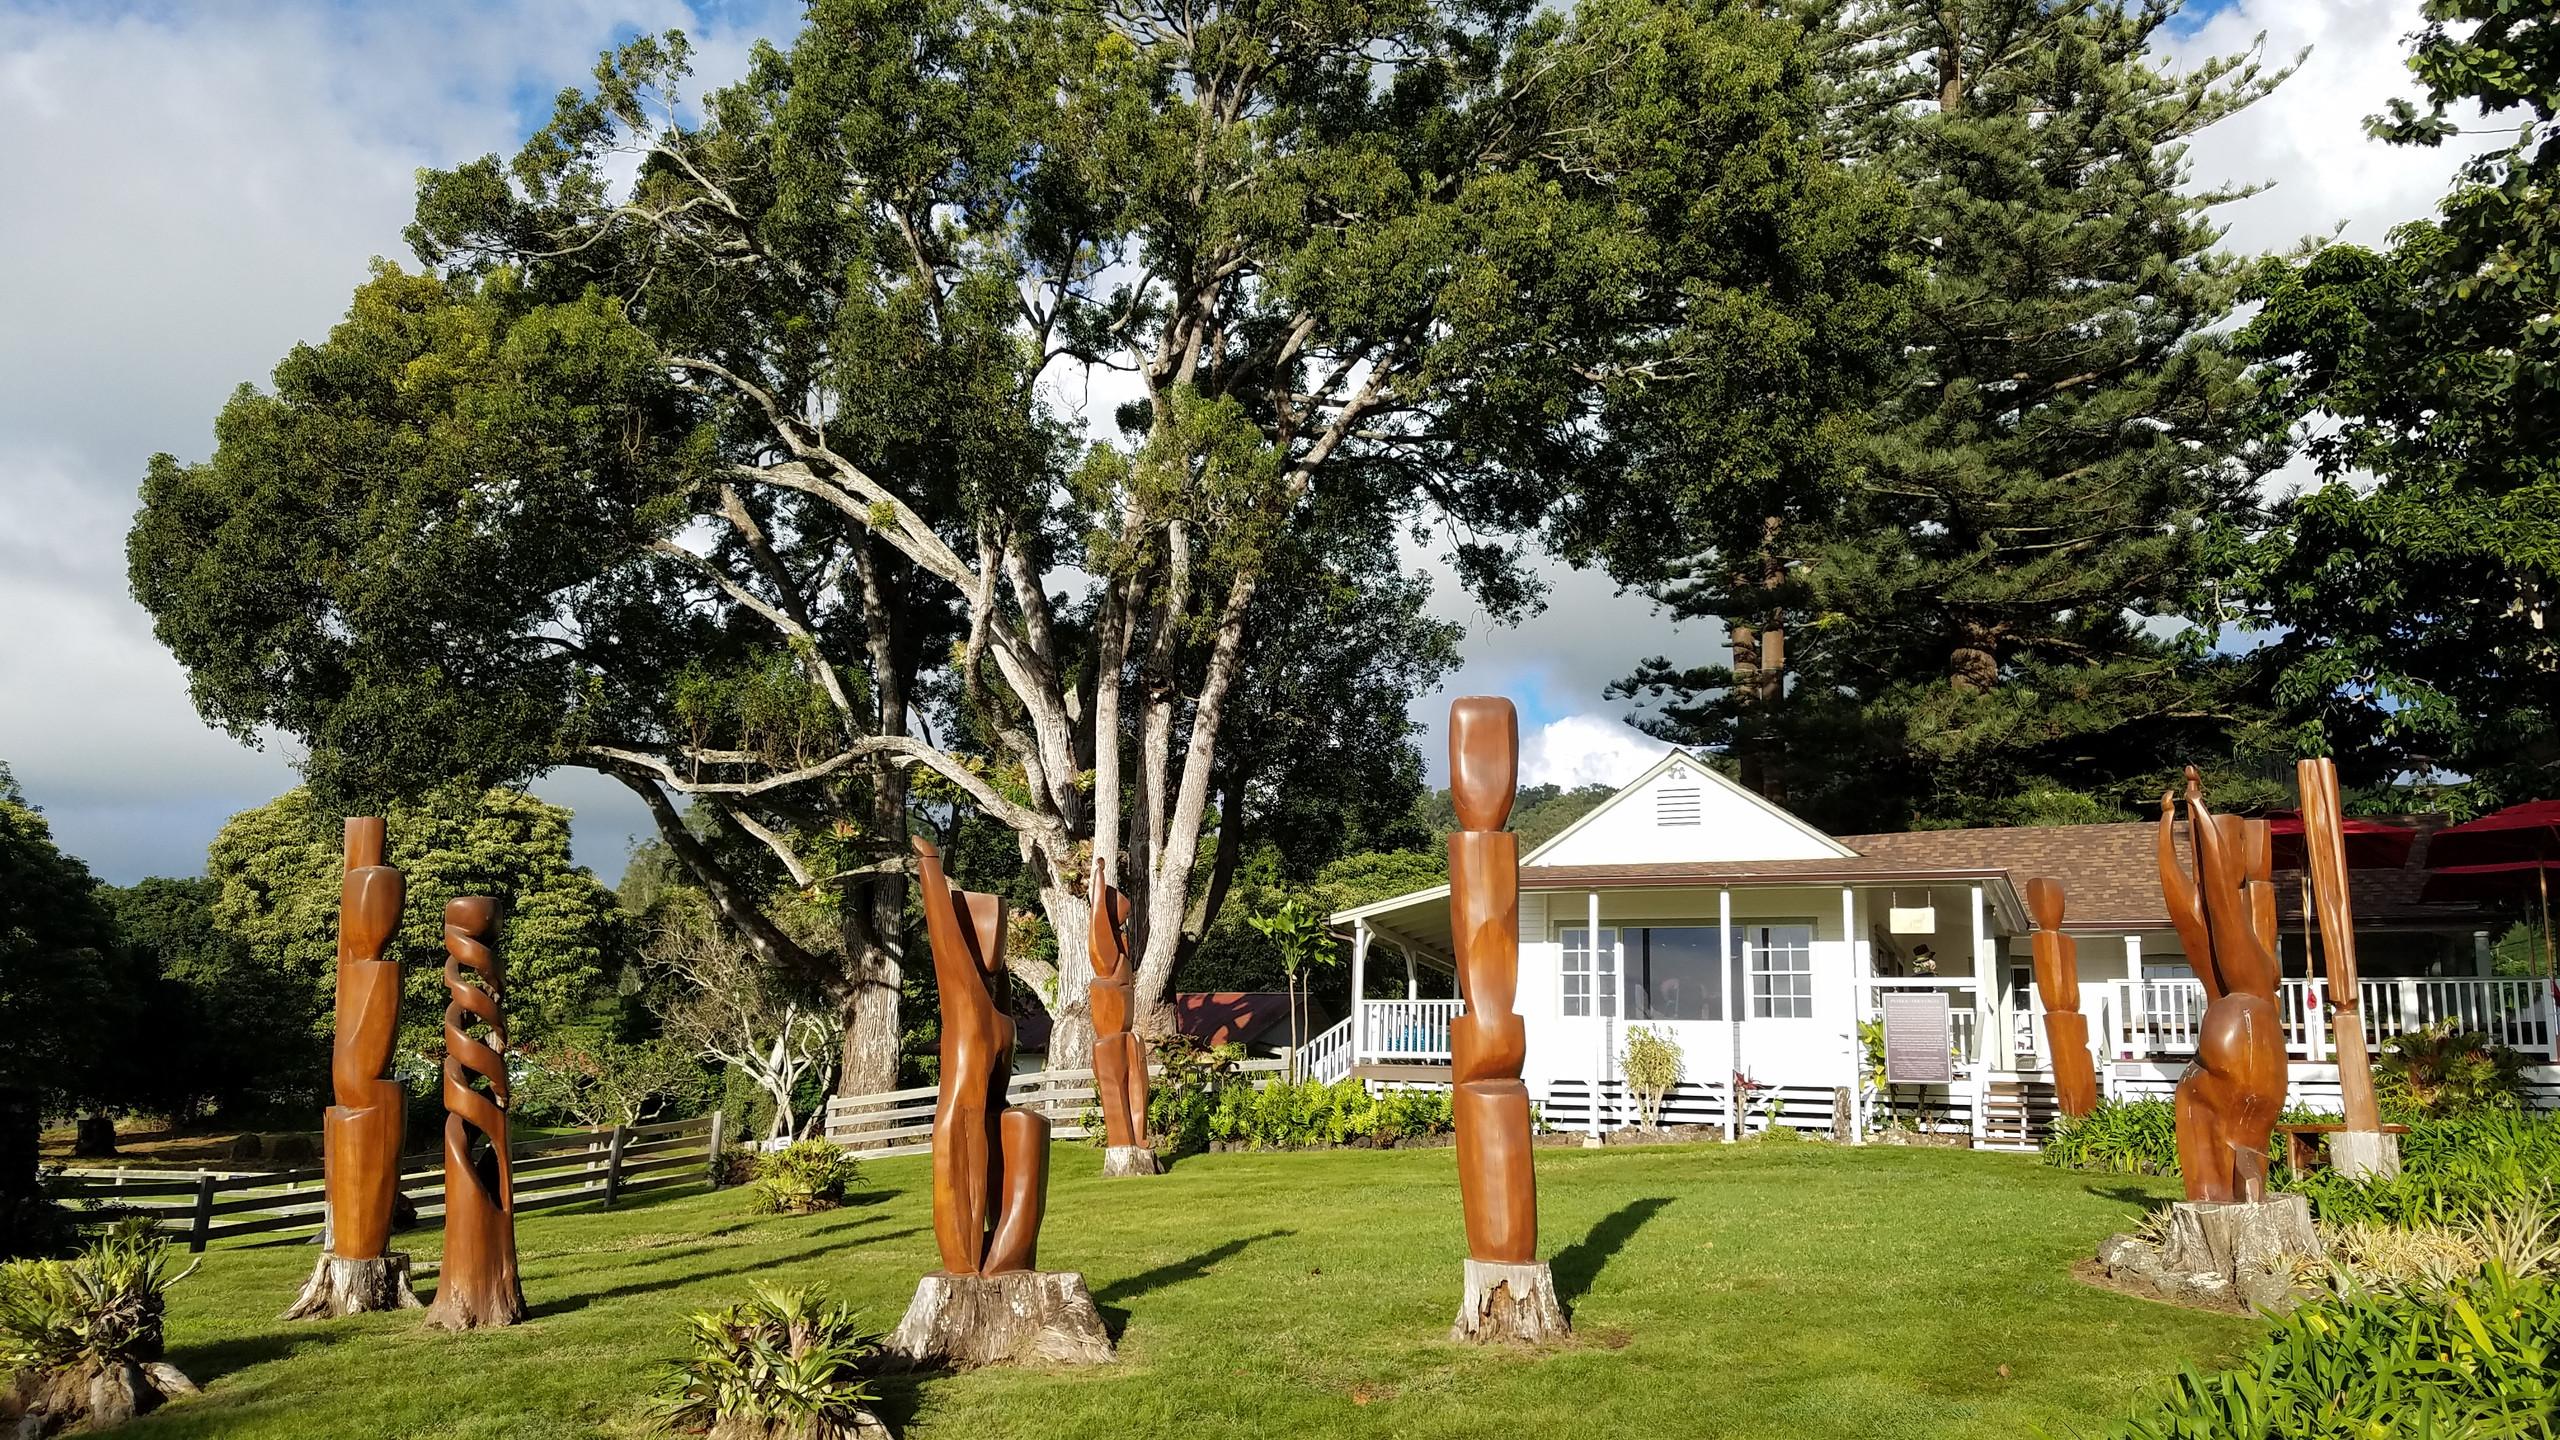 Wood Sculptures at Maui Wine